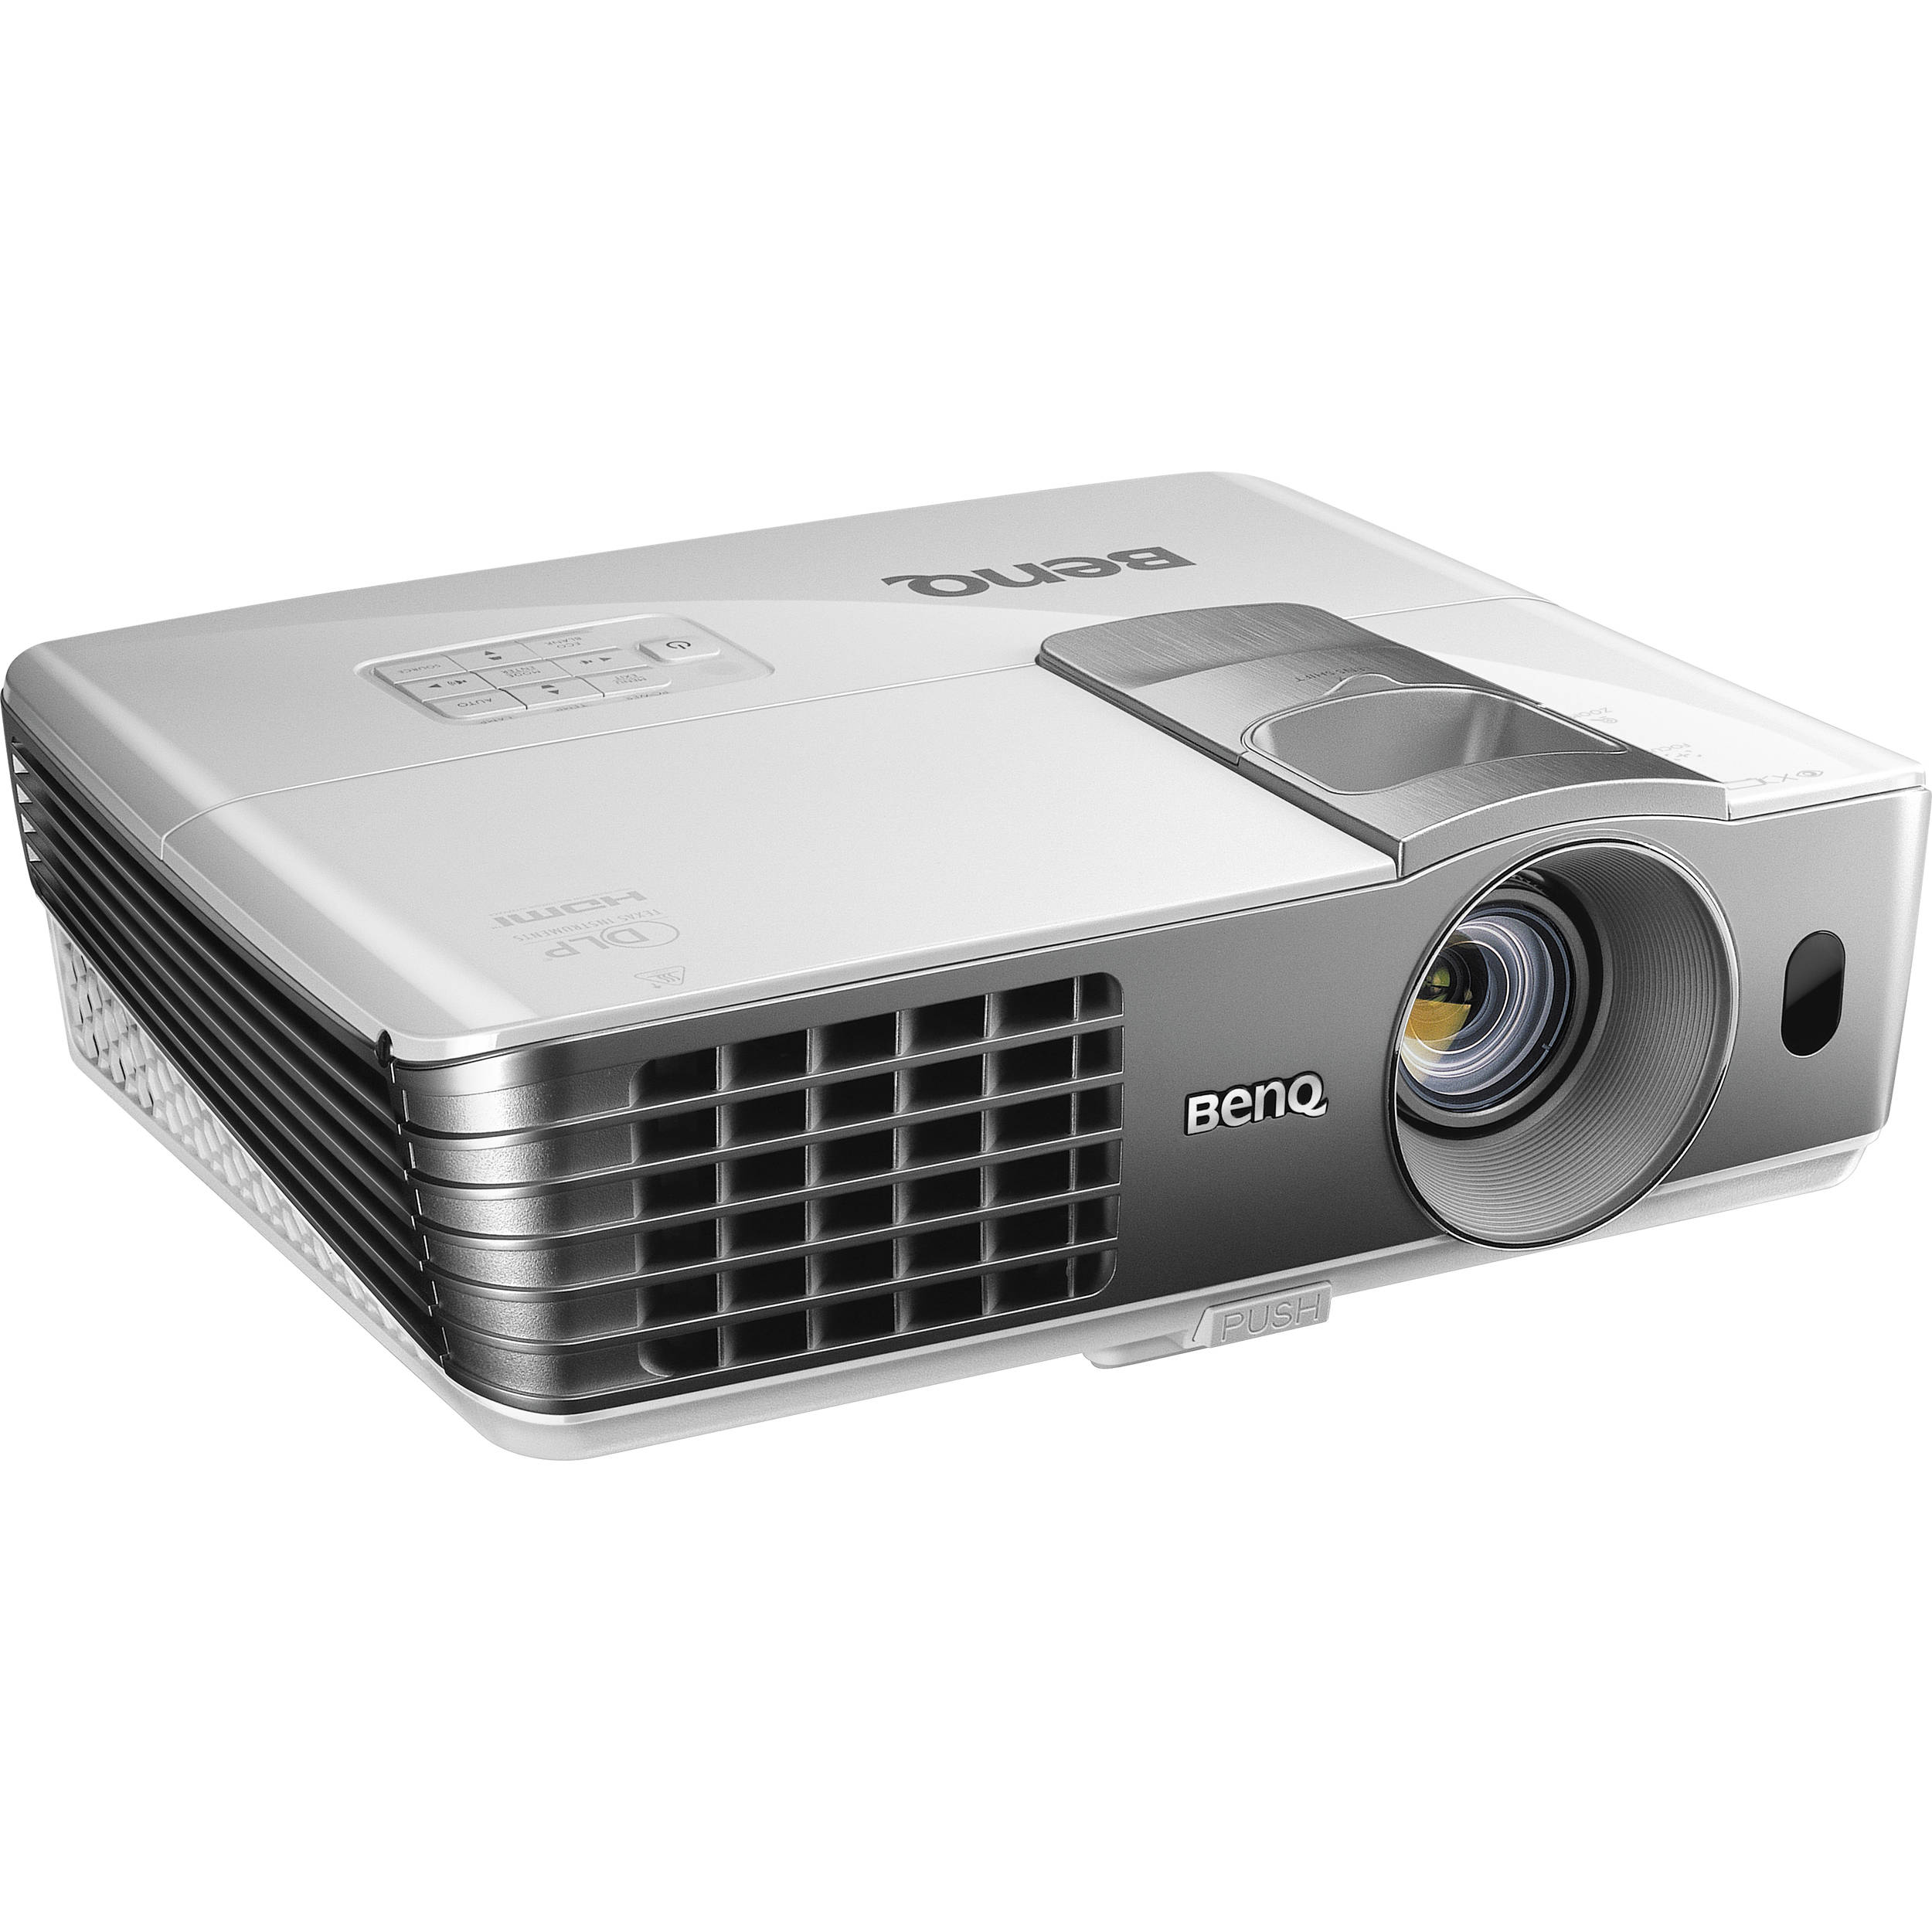 Benq W1070 Full Hd 1080p 3d Dlp Home Entertainment